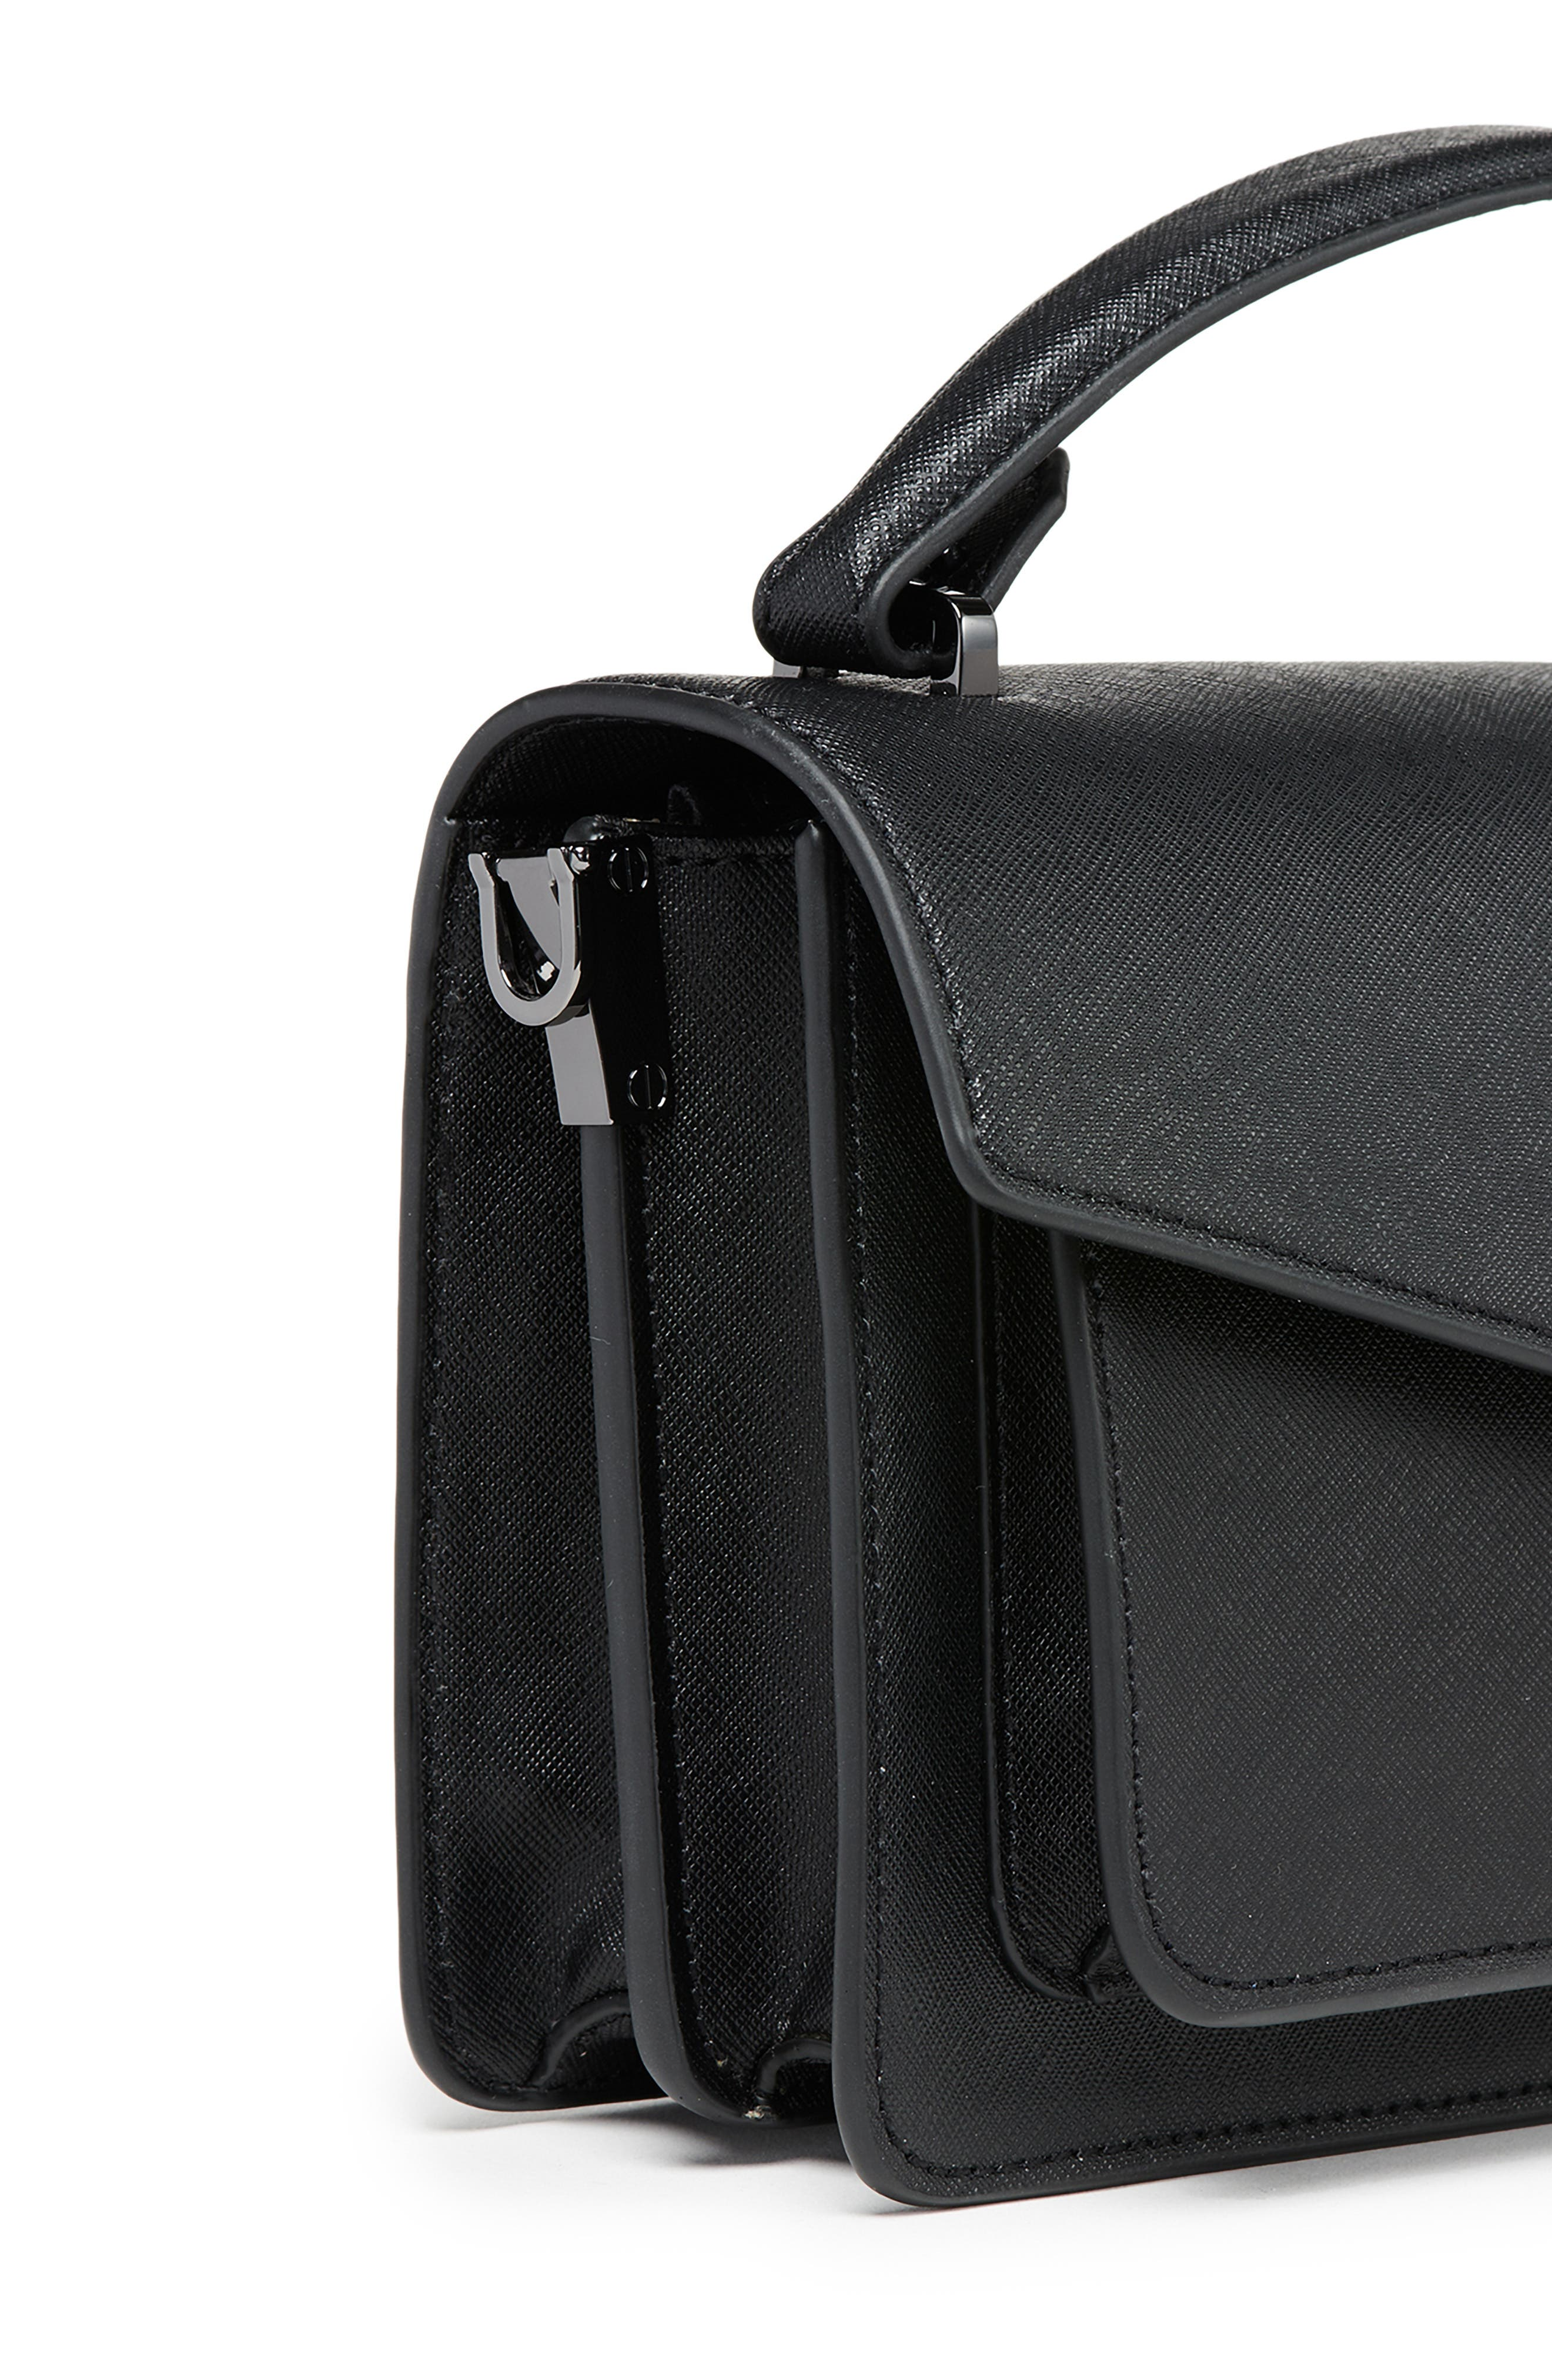 BOTKIER, Cobble Hill Leather Crossbody Bag, Alternate thumbnail 8, color, BLACK